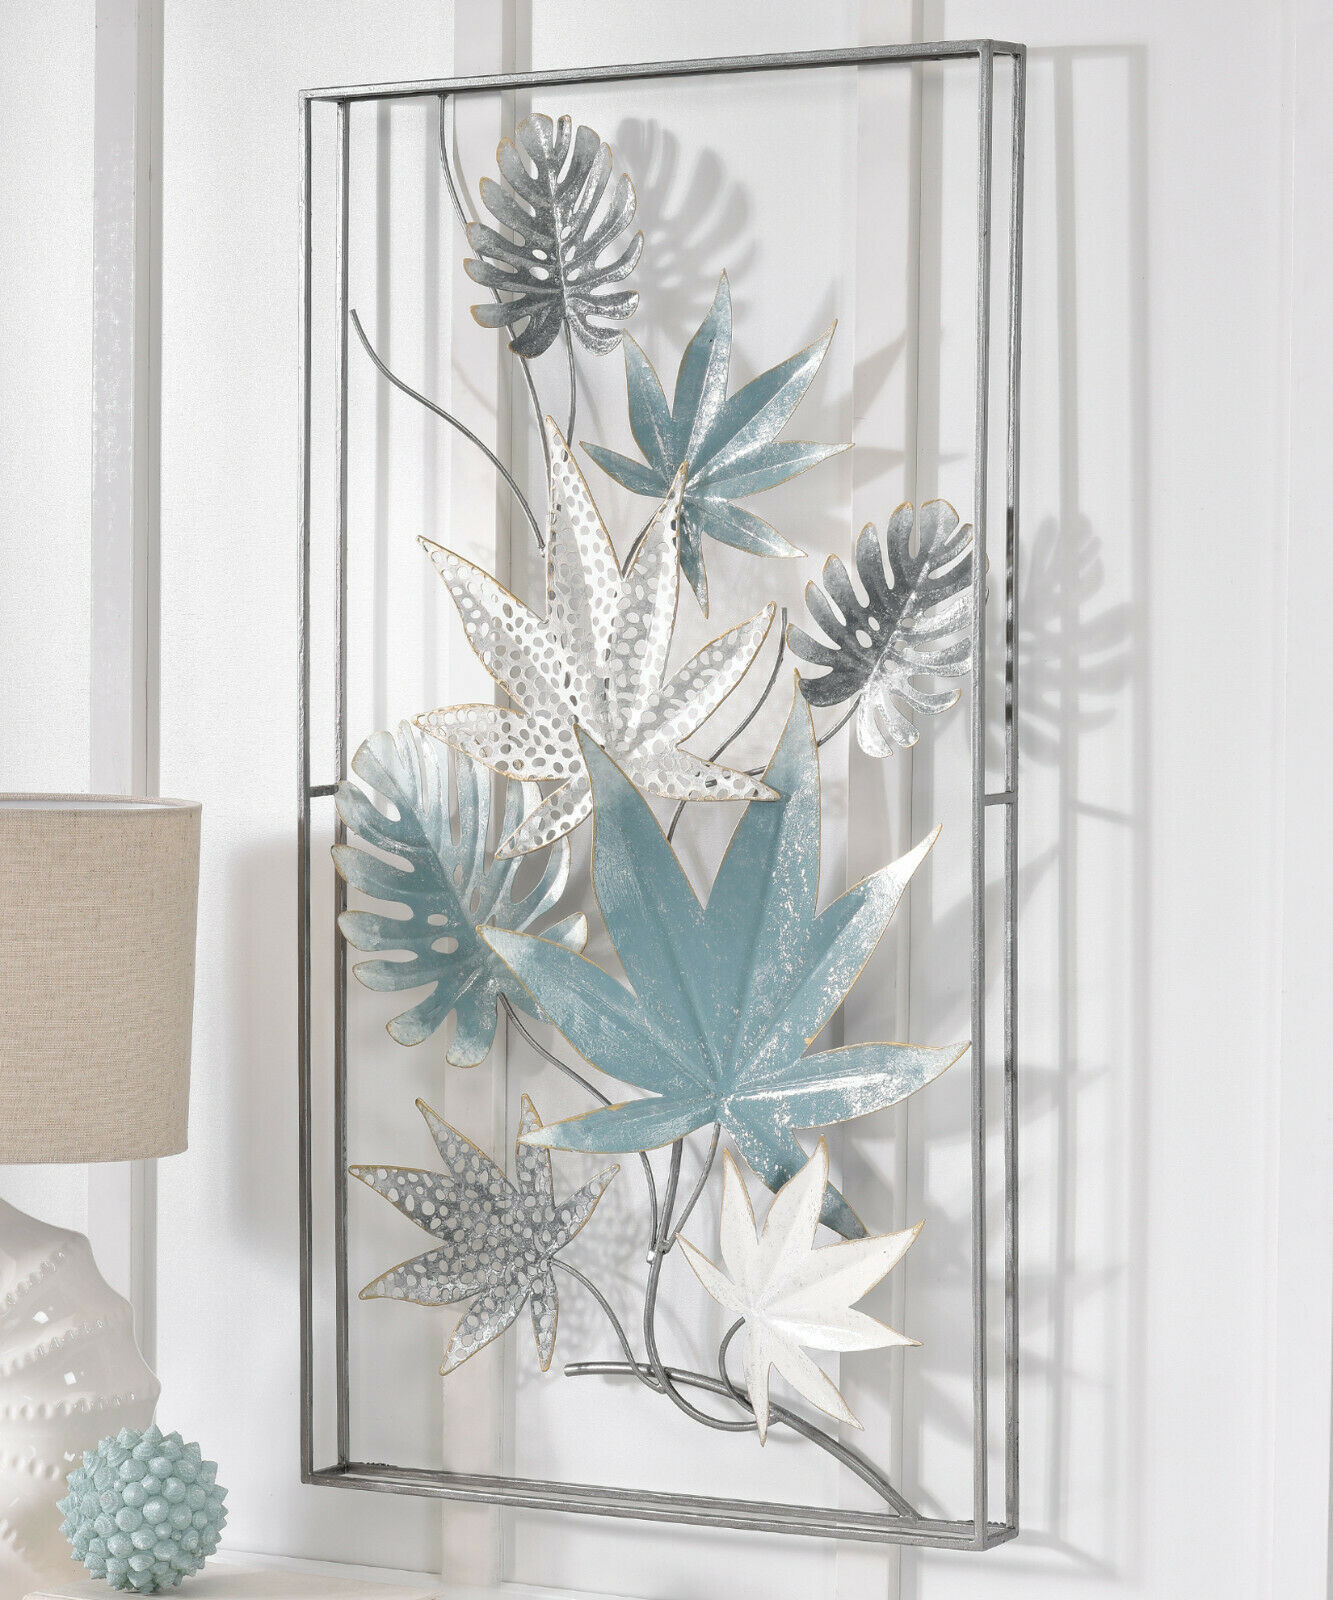 "35"" High Blue Grey & White Leaves Design Inside Black 3D Metal Frame Wall Decor"